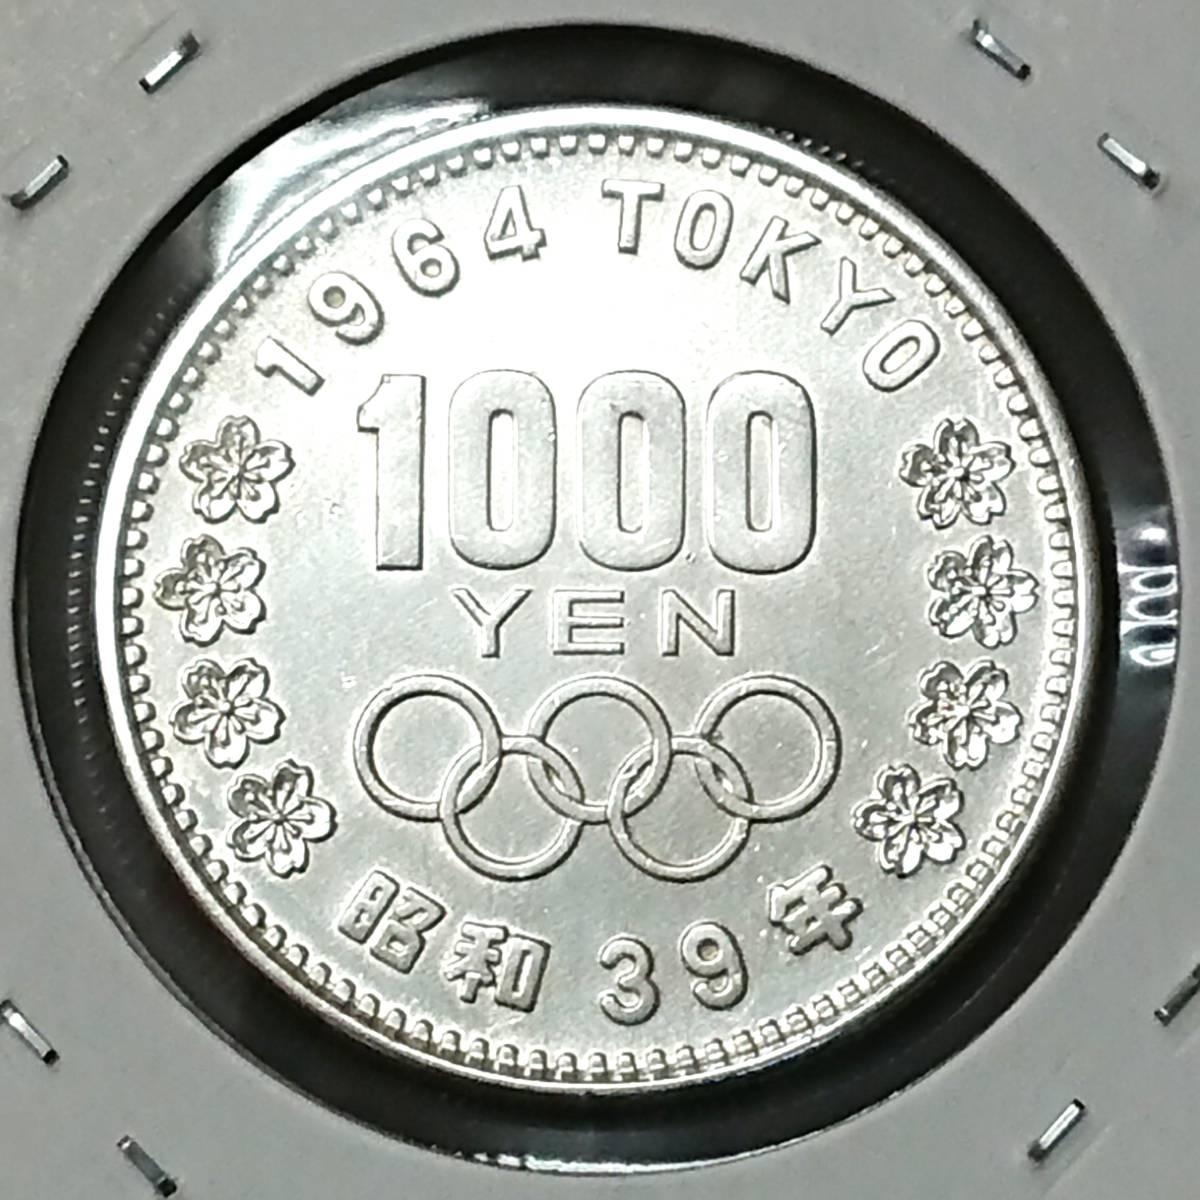 ☆昭和39年東京オリンピック記念1000円銀貨未使用美品《貨幣硬貨》②☆_画像2